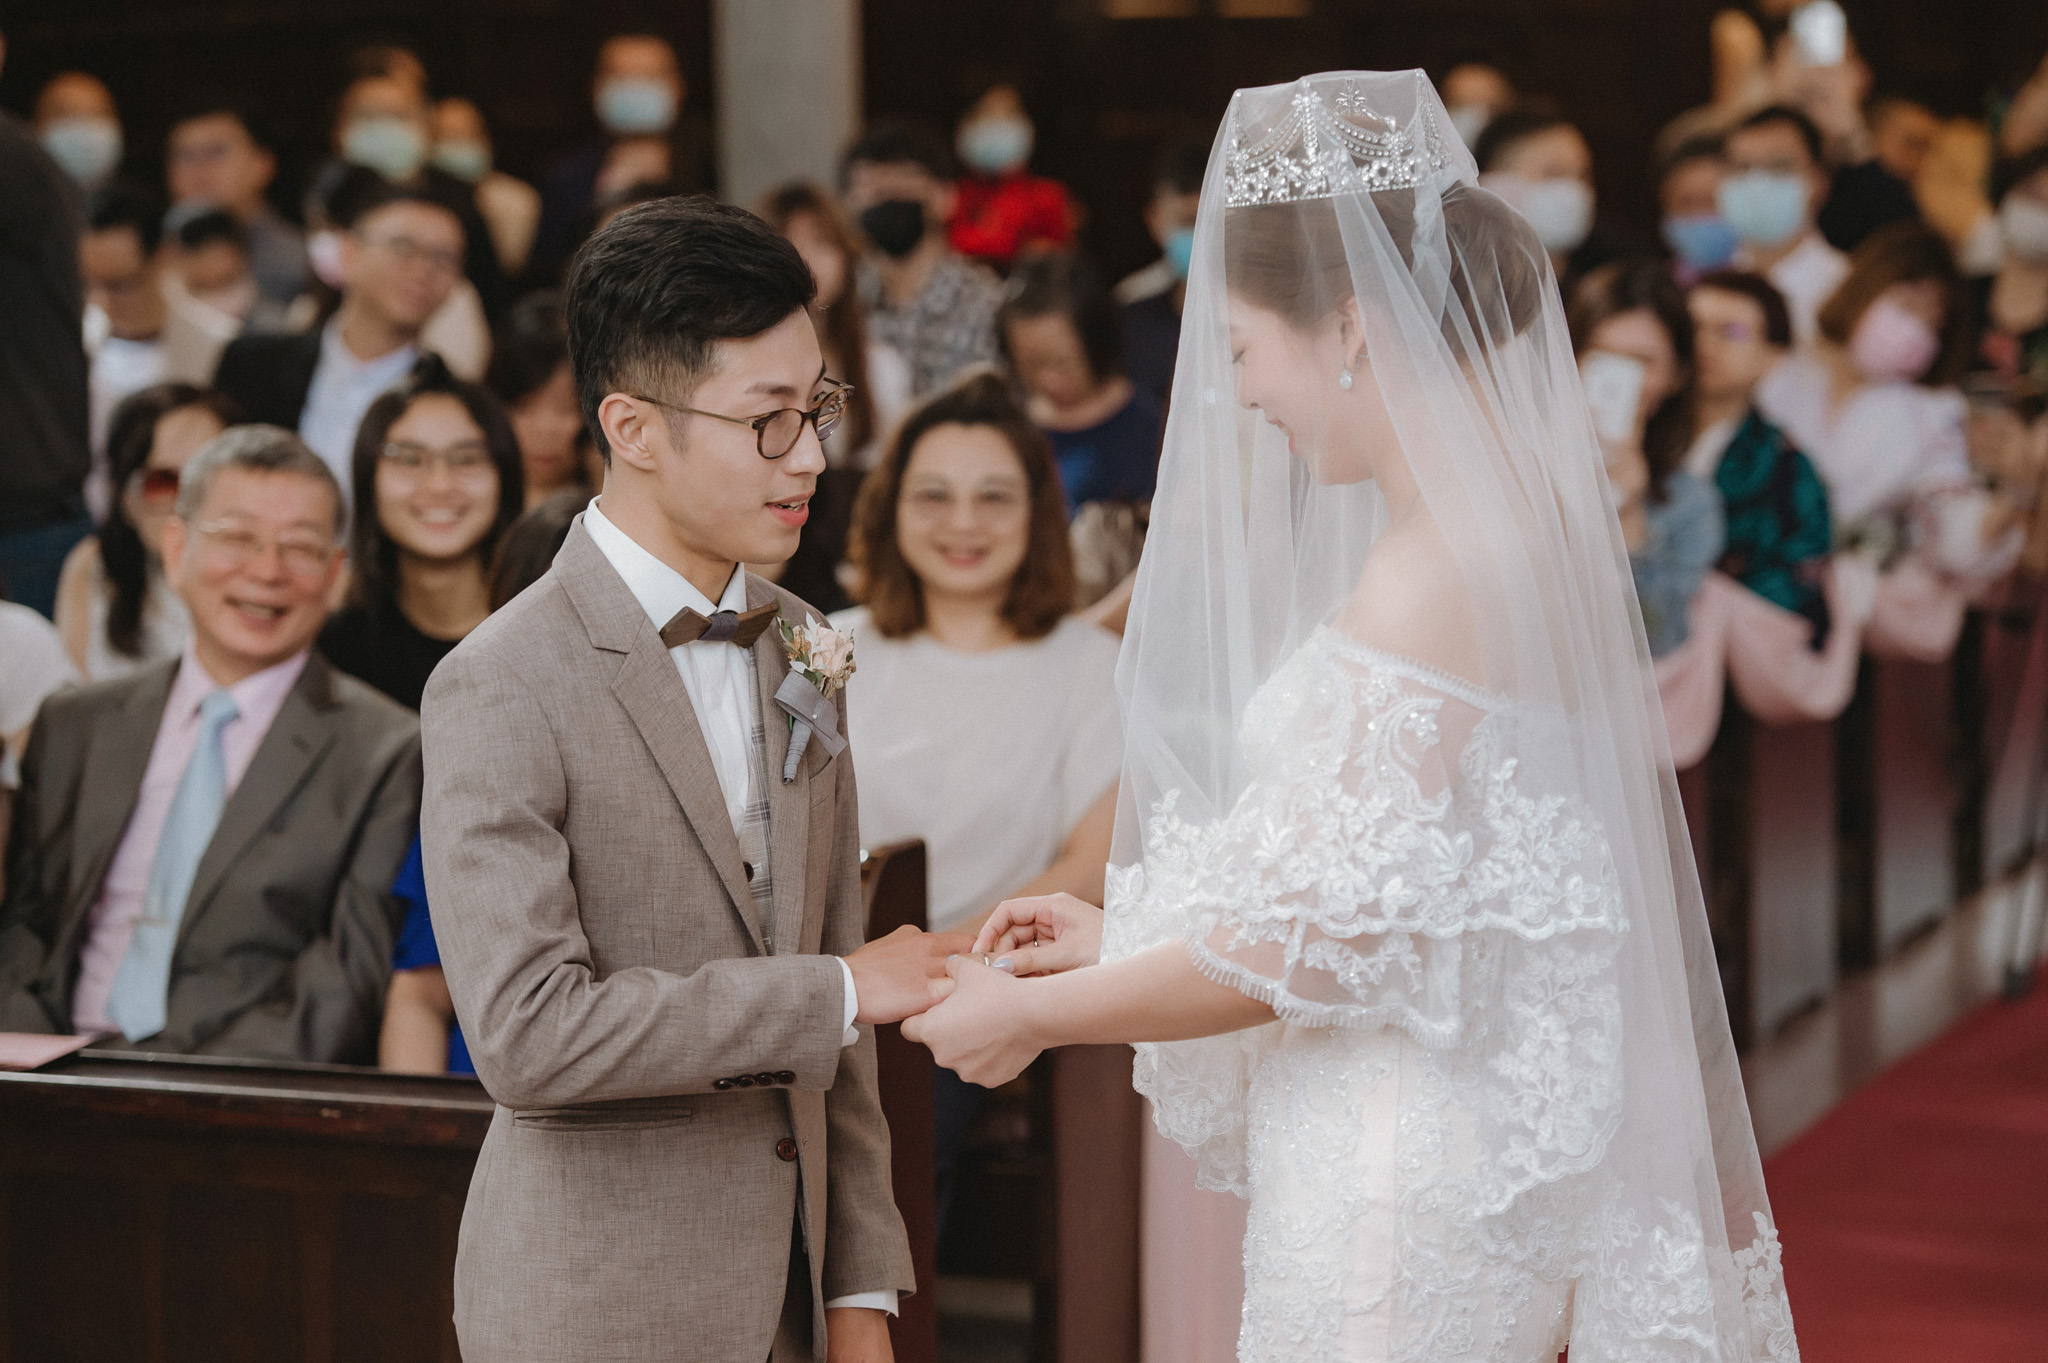 EW 台北婚攝 居米 濟南教會 Brick Yard 33 美軍俱樂部 婚禮 婚宴-31